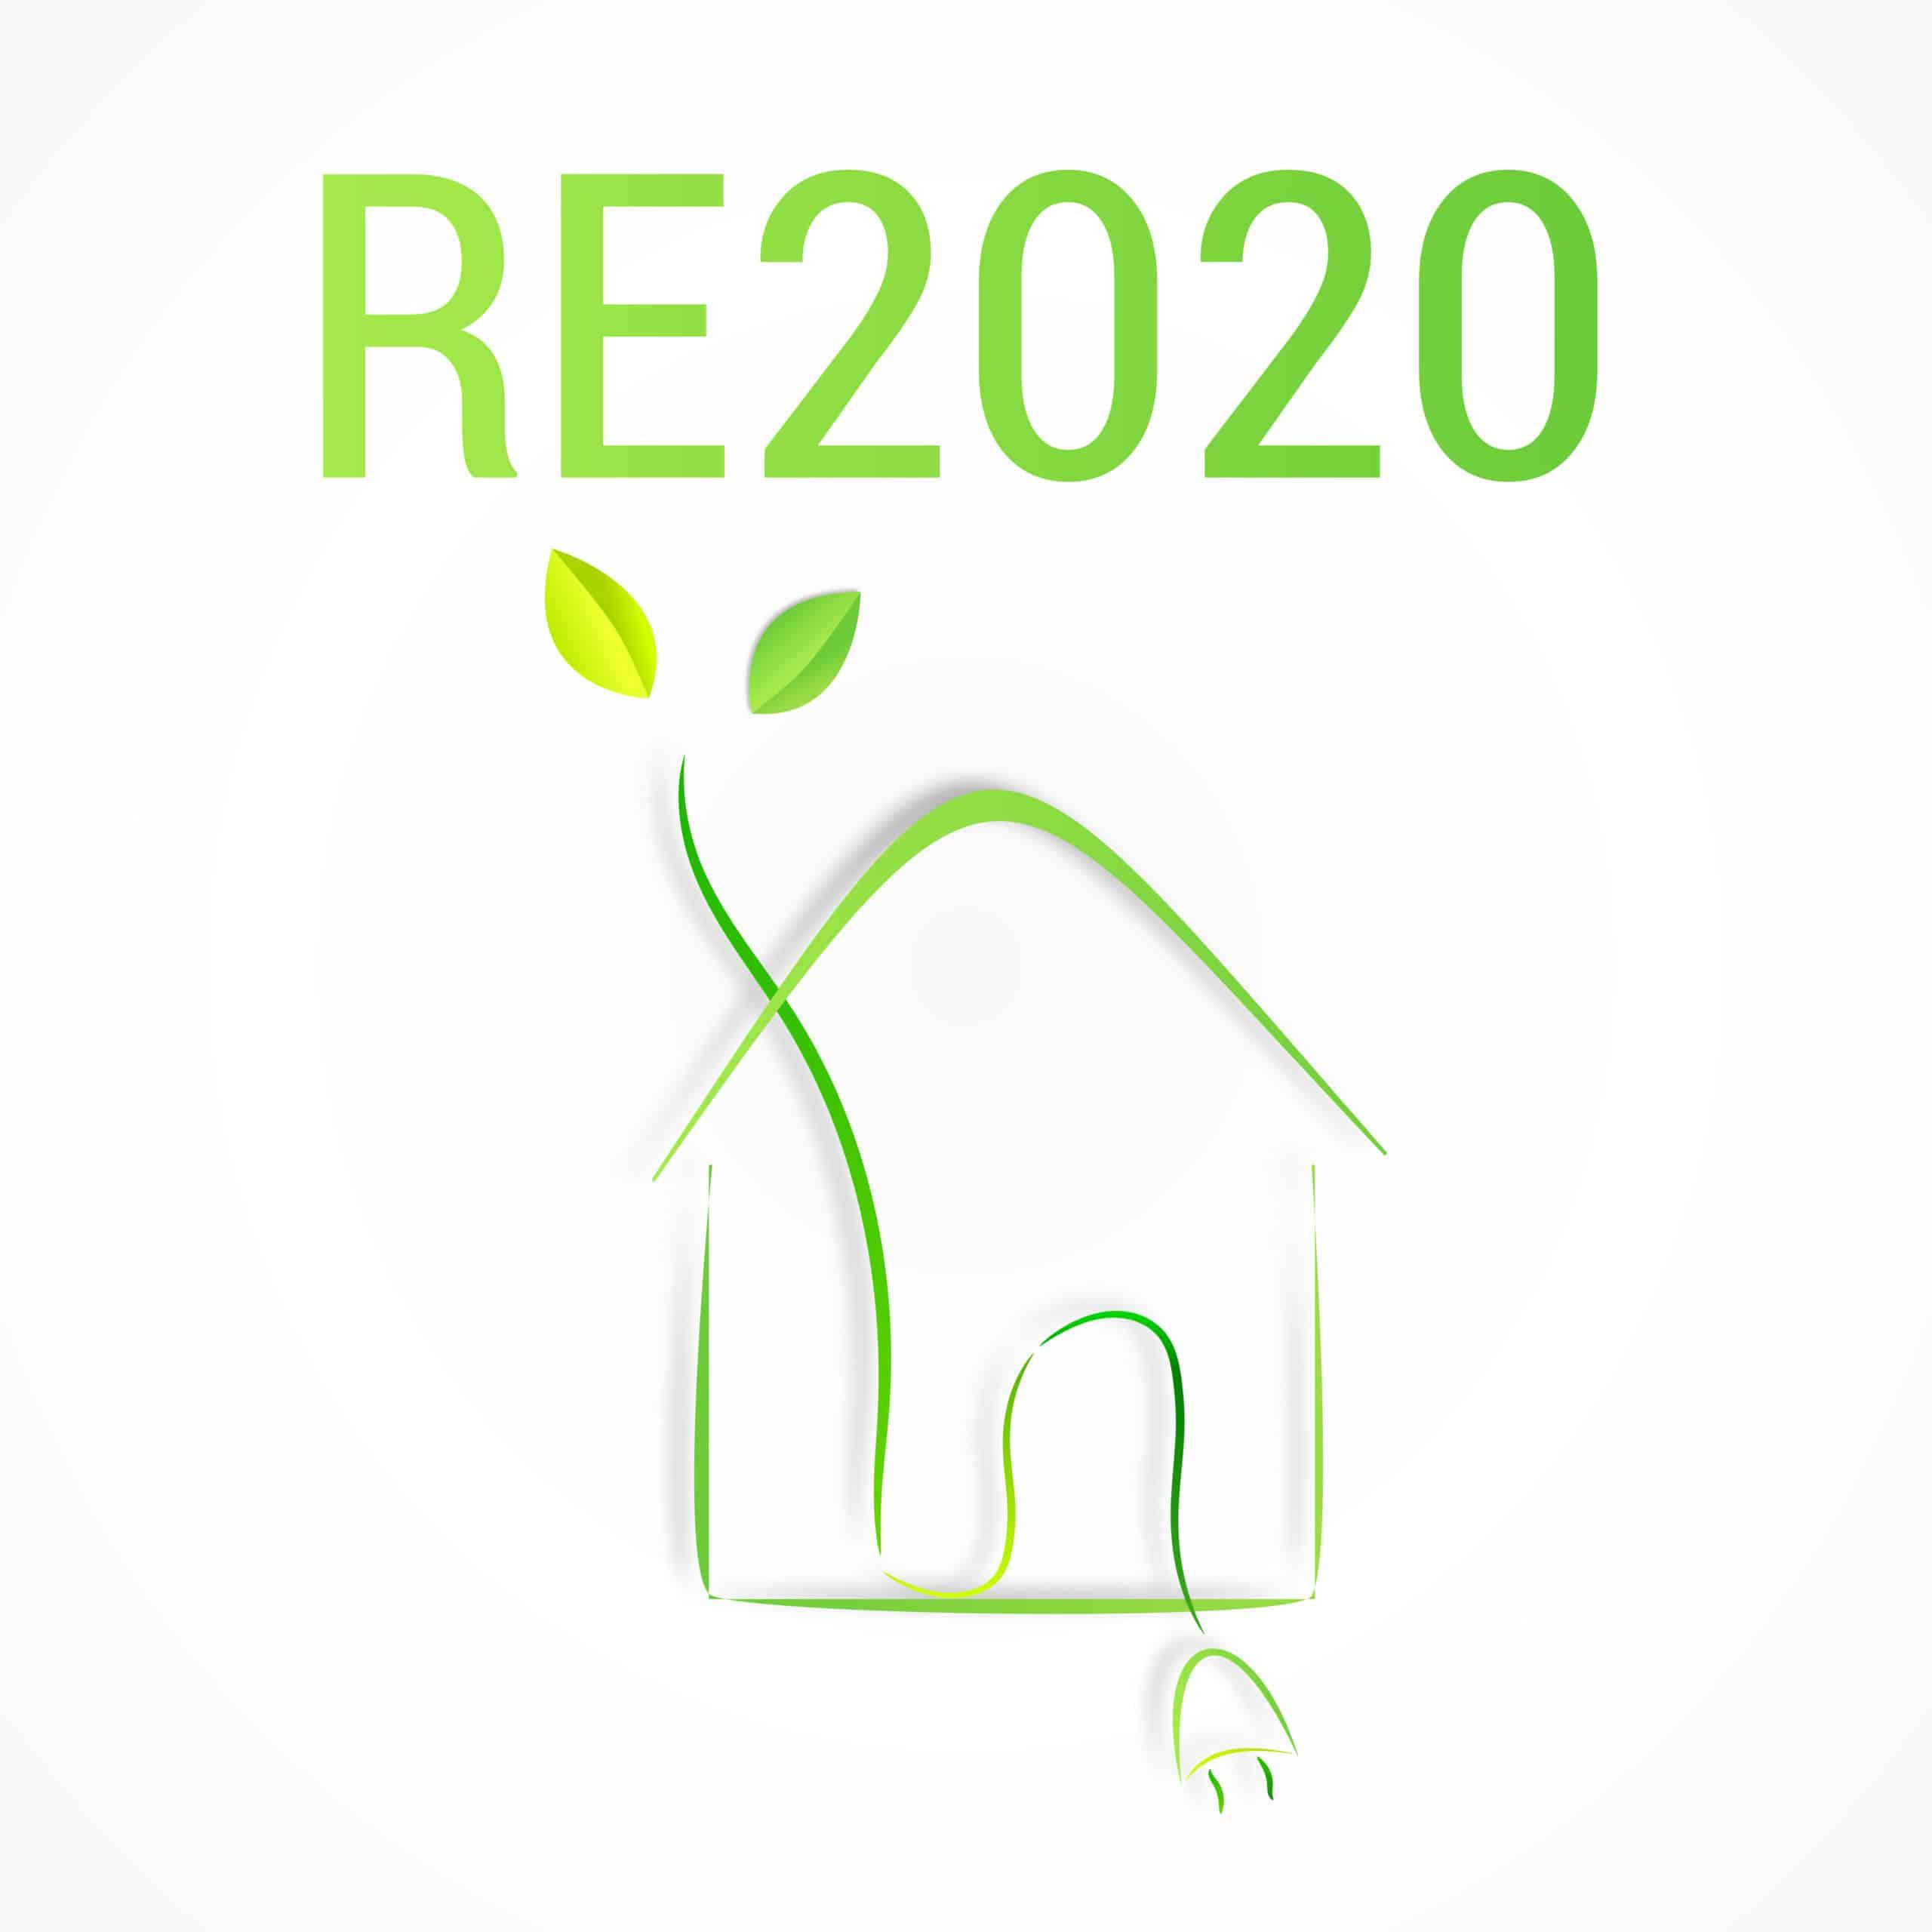 RE2020 reglementation environnement batiment construction isolation polystyrene